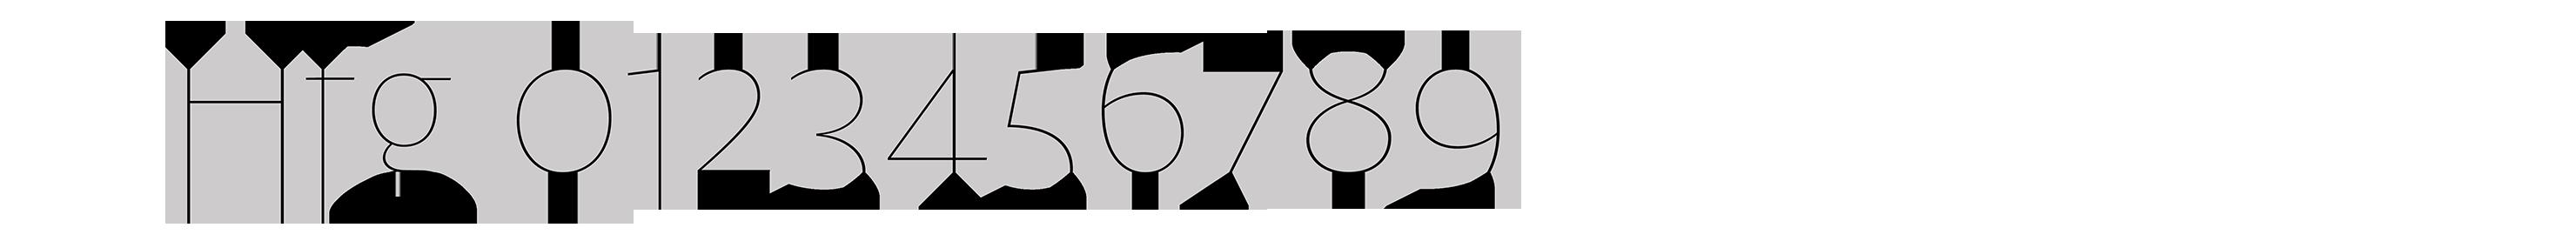 Typeface-Novel-Sans-Hairline-F12-Atlas-Font-Foundry